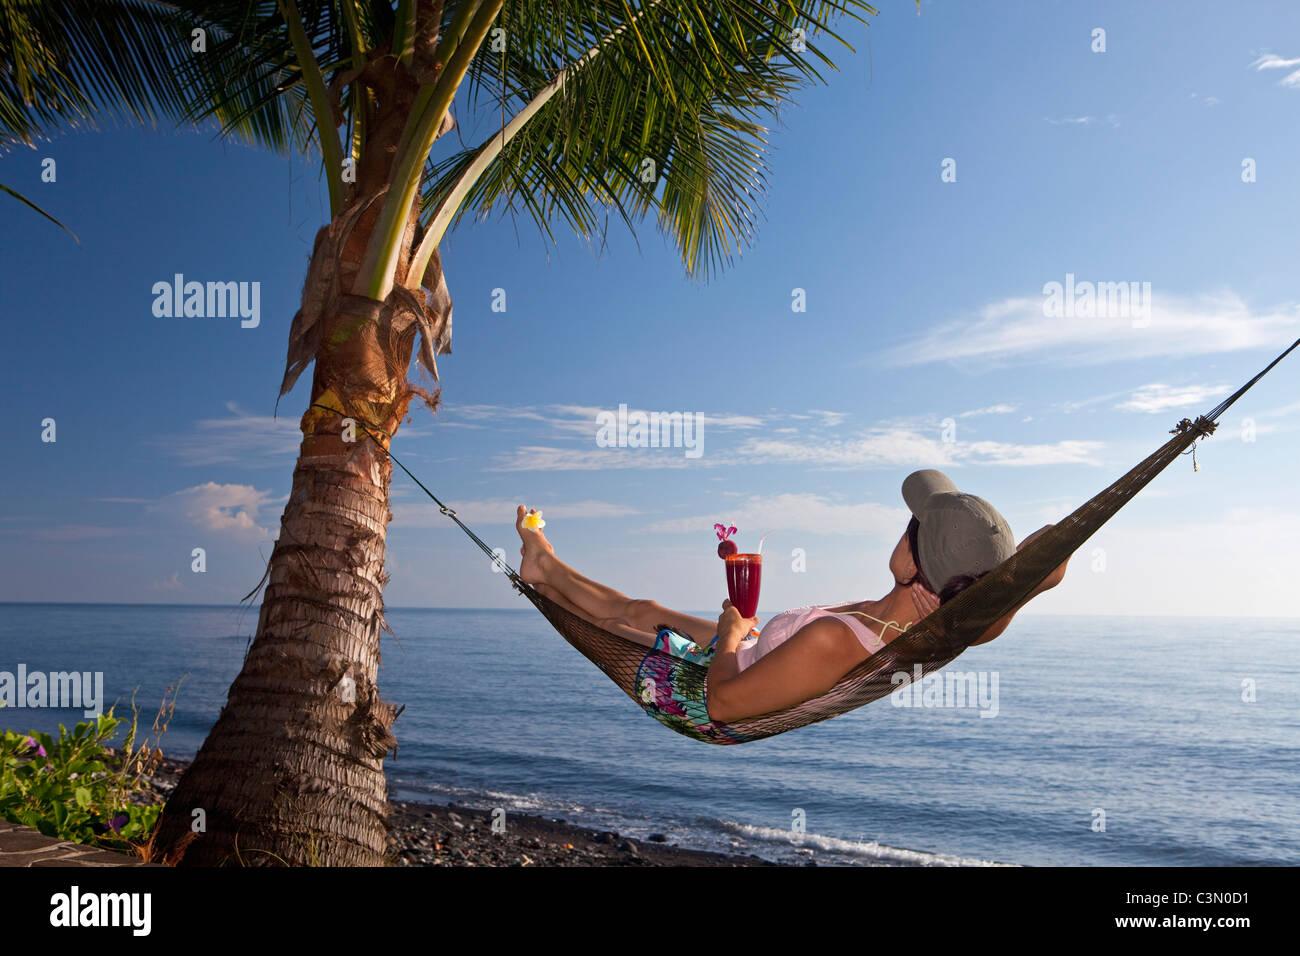 Indonesia, Island Bali, near Tejakula village, Gaia Oasis Resort. Women, tourist, in hammock drinking fruit cocktail. - Stock Image